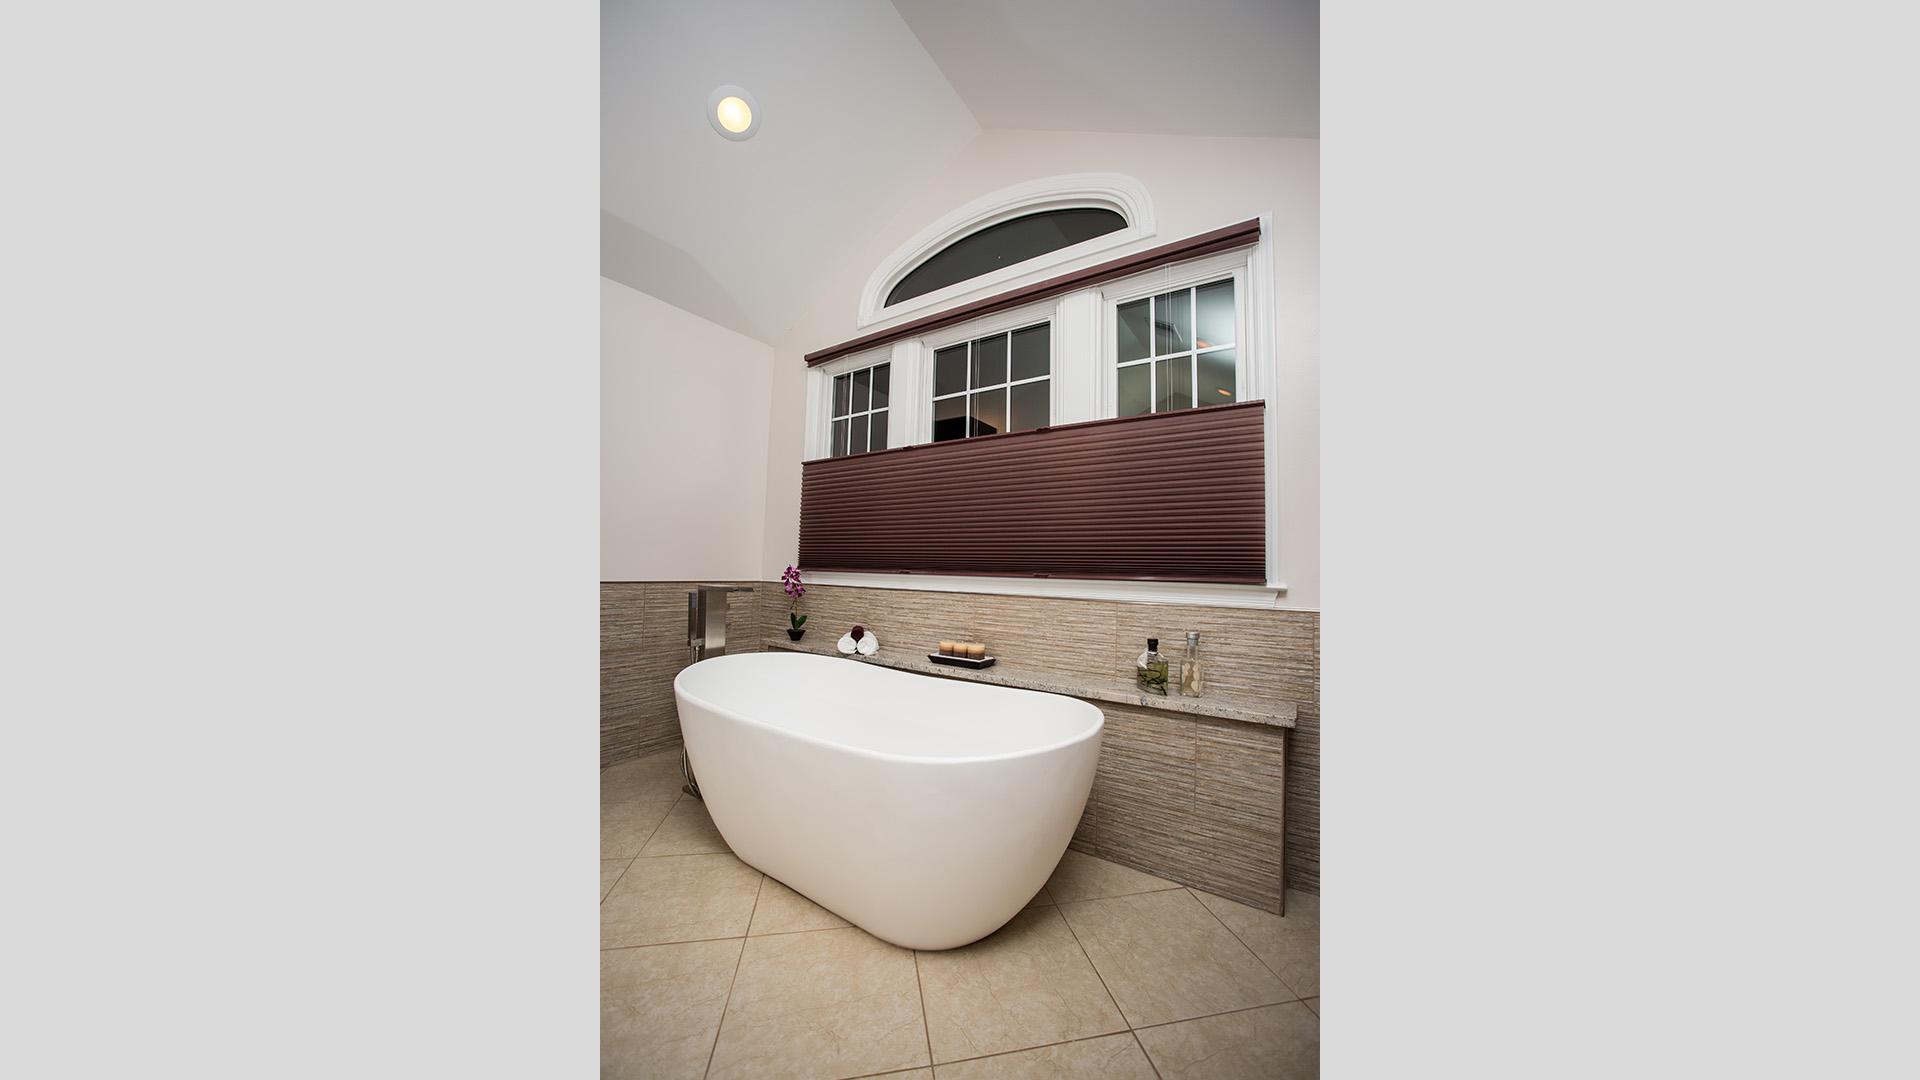 2016 National NARI CotY Southeast Regional Award Winner, Residential Bath $50,001 to $75,000